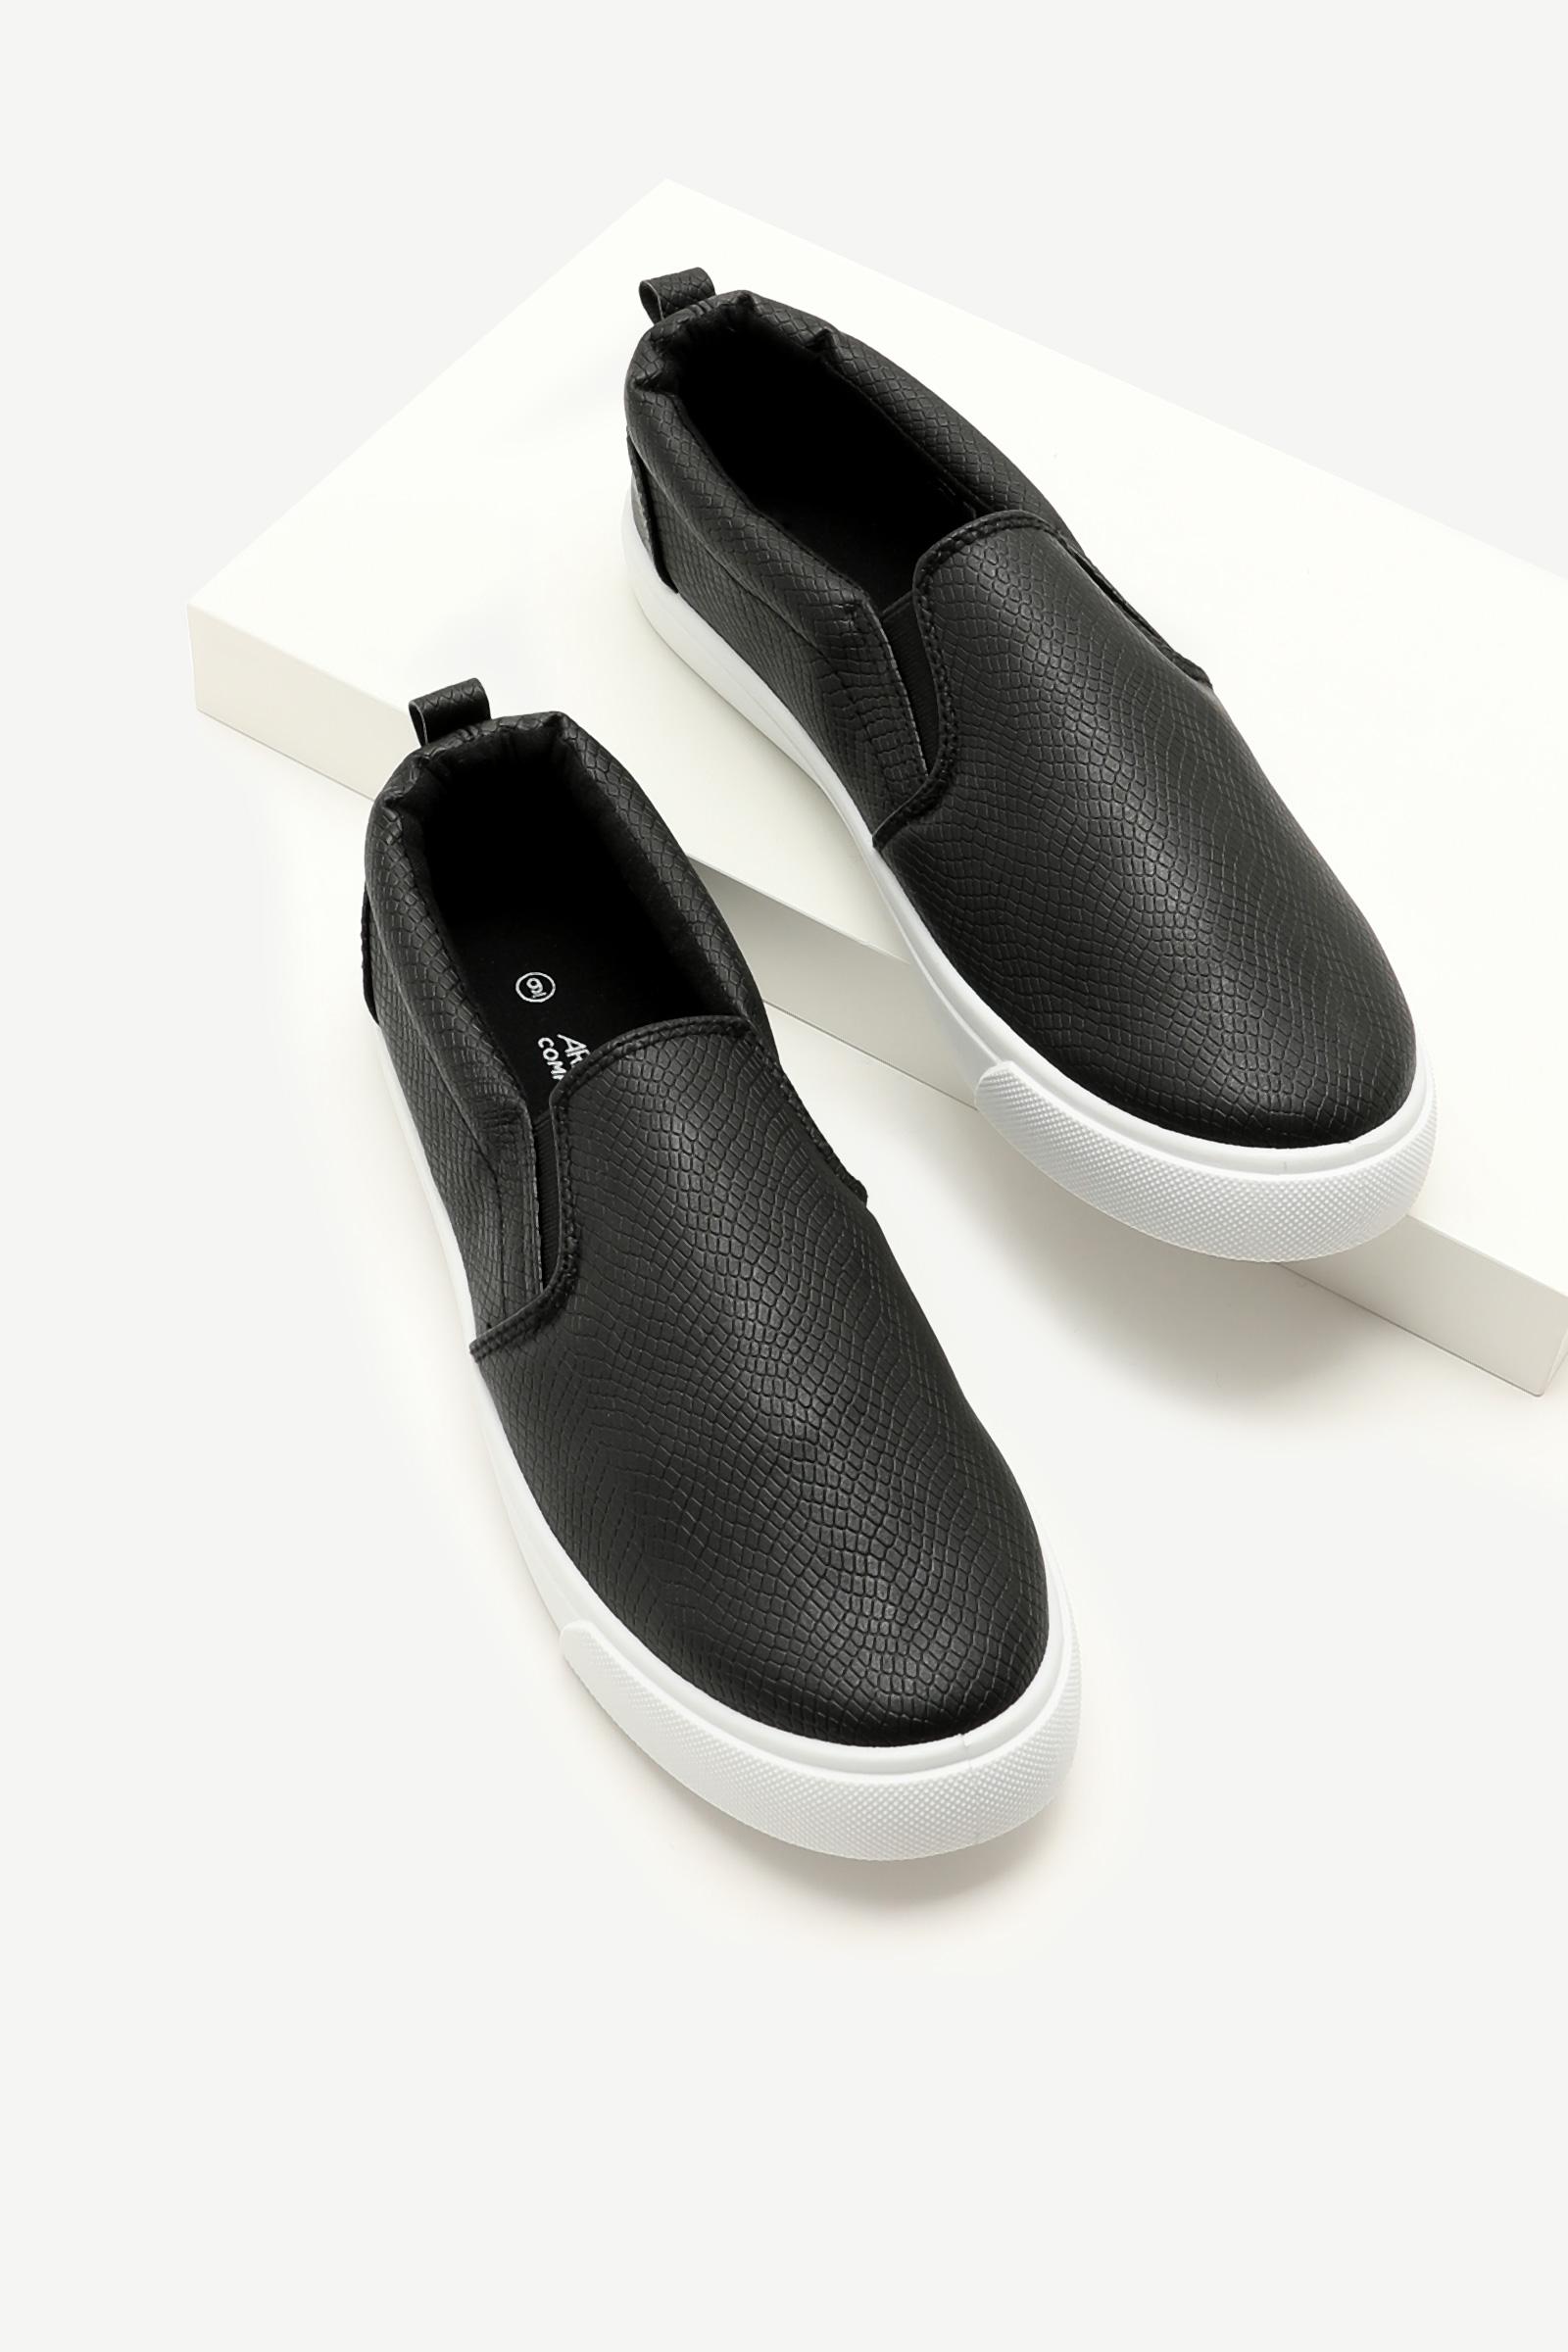 Snakeskin Slip-on Sneakers